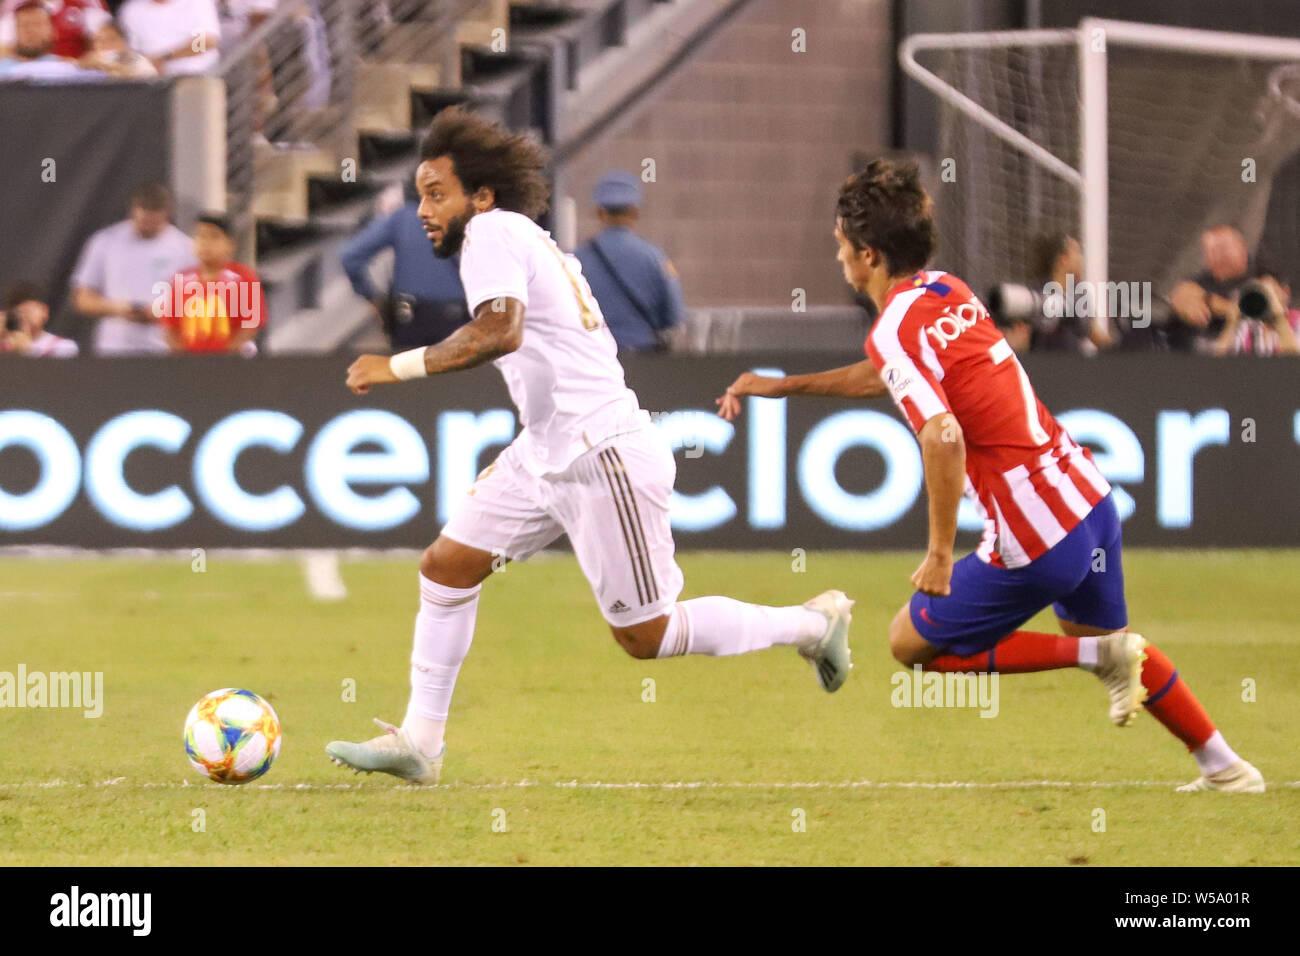 Betis Vs Bilbao 3 2 Highlights Goals Video 8 12 2019